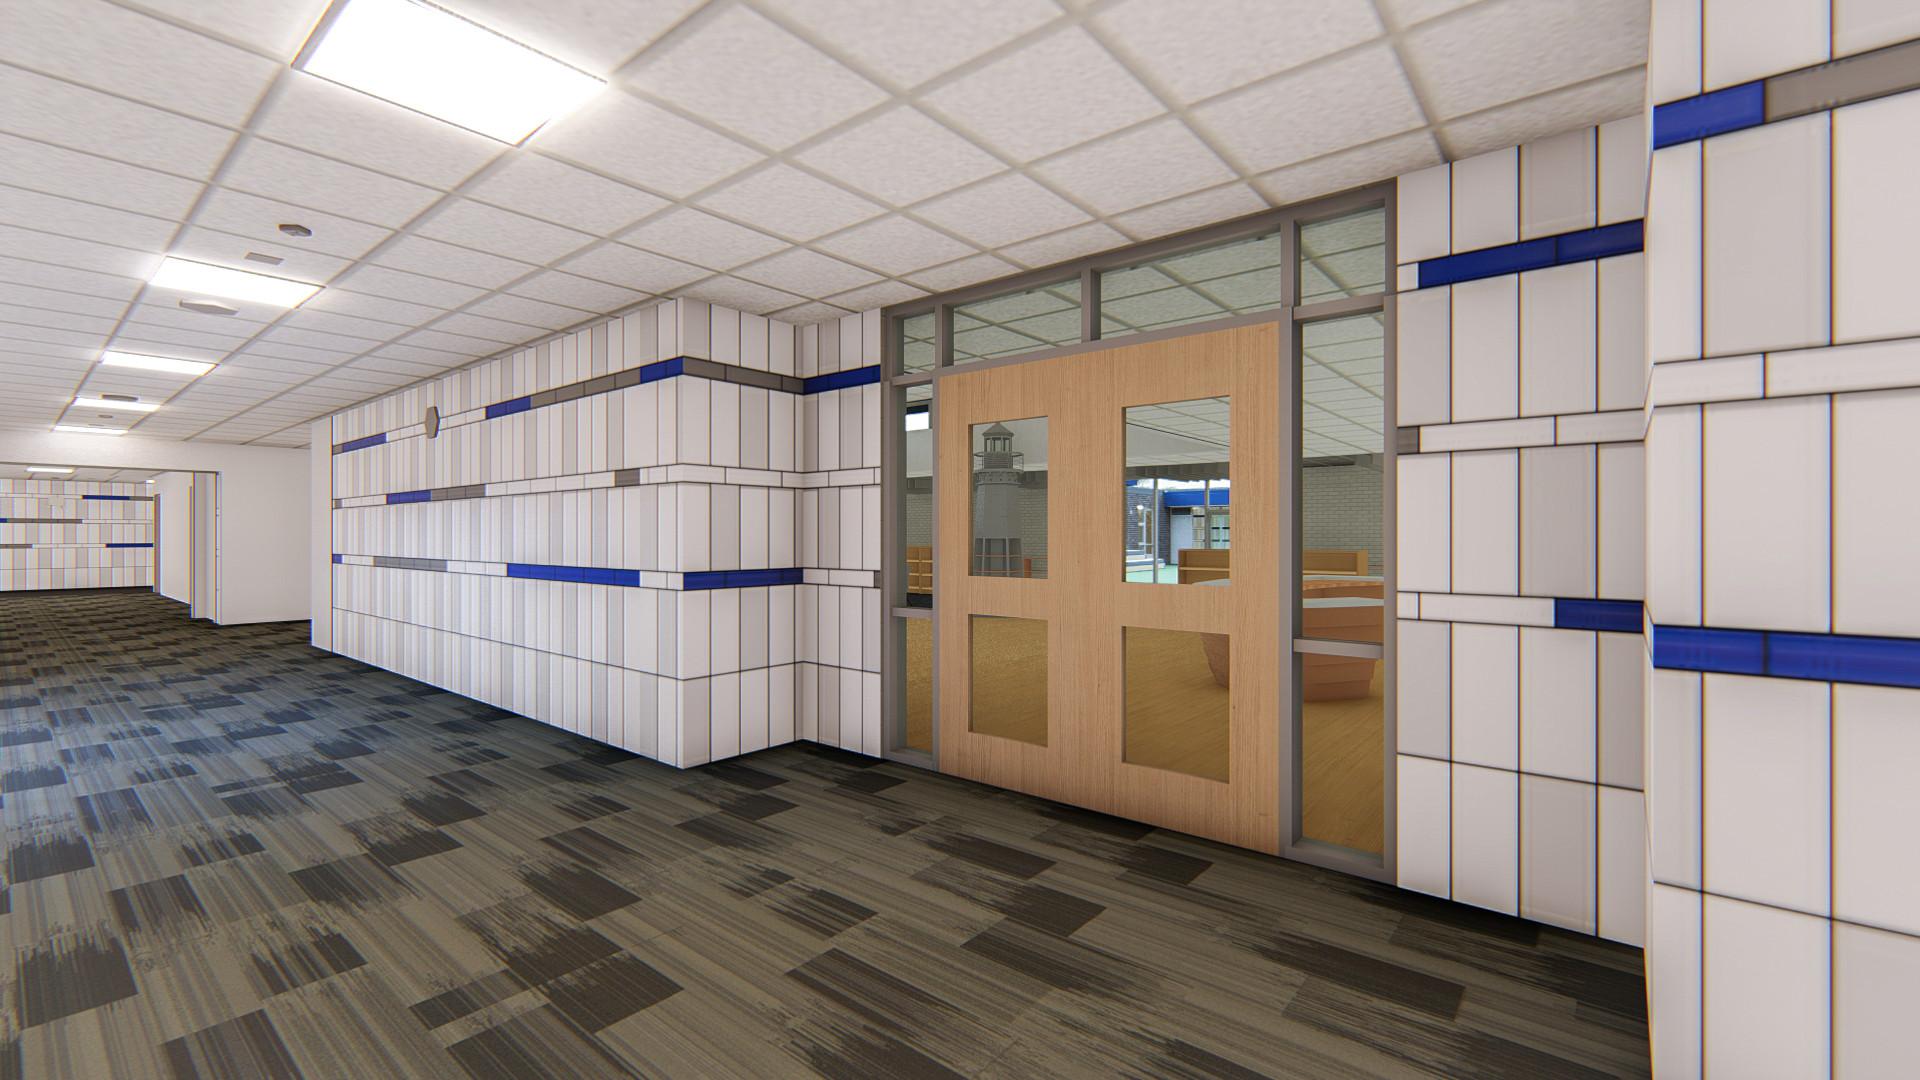 Mona - Ross Park - Tile Pattern Typical